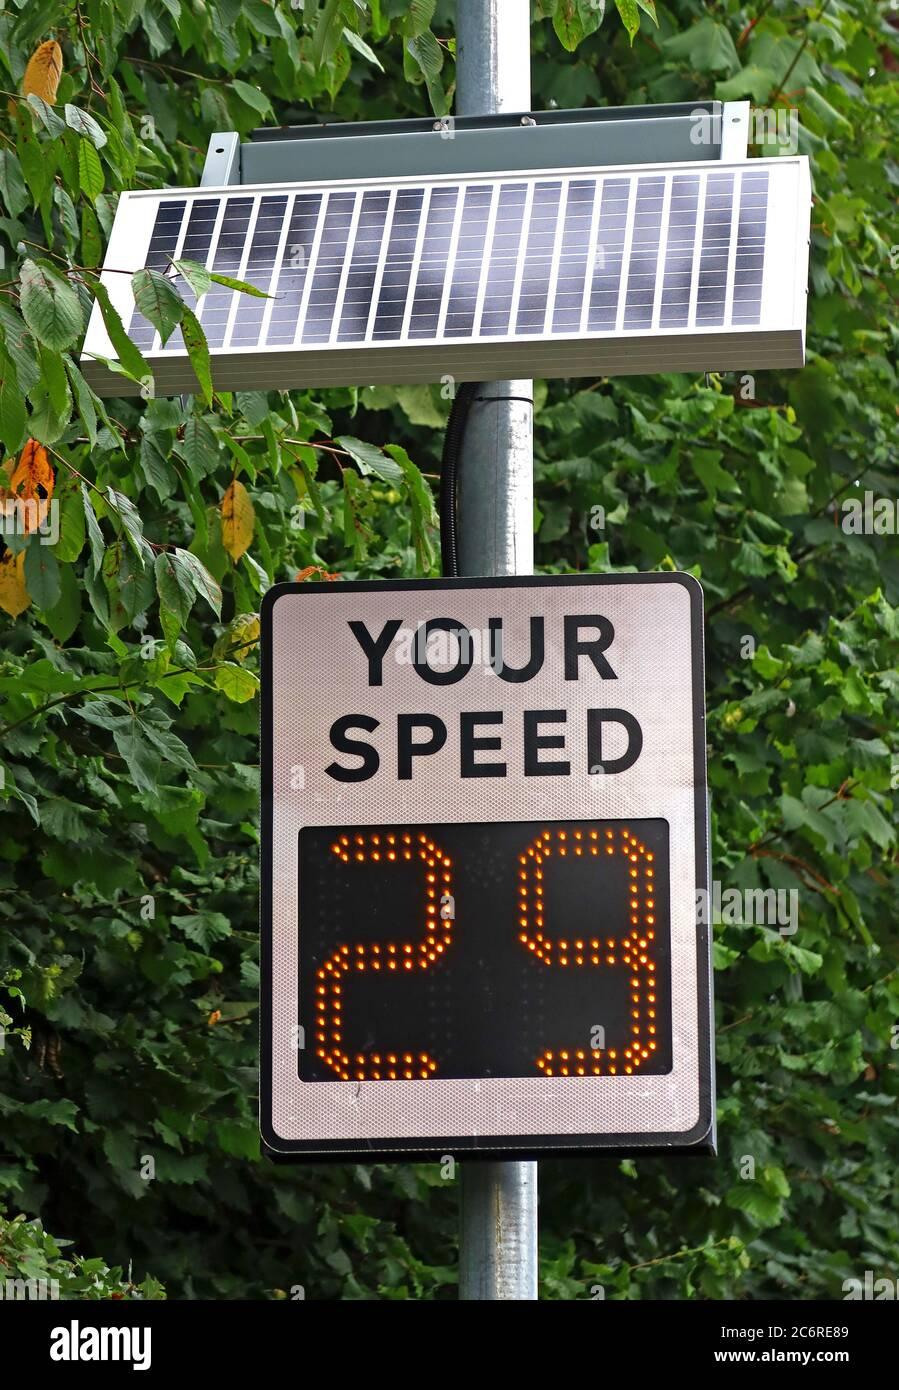 GoTonySmith,HotpixUK,@HotpixUK,England,Cheshire,UK,Warrington,Grappenhall,Thelwall,motorist,driver,community,group,problem of speeding traffic,problem,traffic,30 zone,30mph,zone,30 mph,solar powered,radar,speed radar,WA4,keeping to 30mph,limit,29mph,29 mph,keeping,under speed limit,30 means 30,30means30